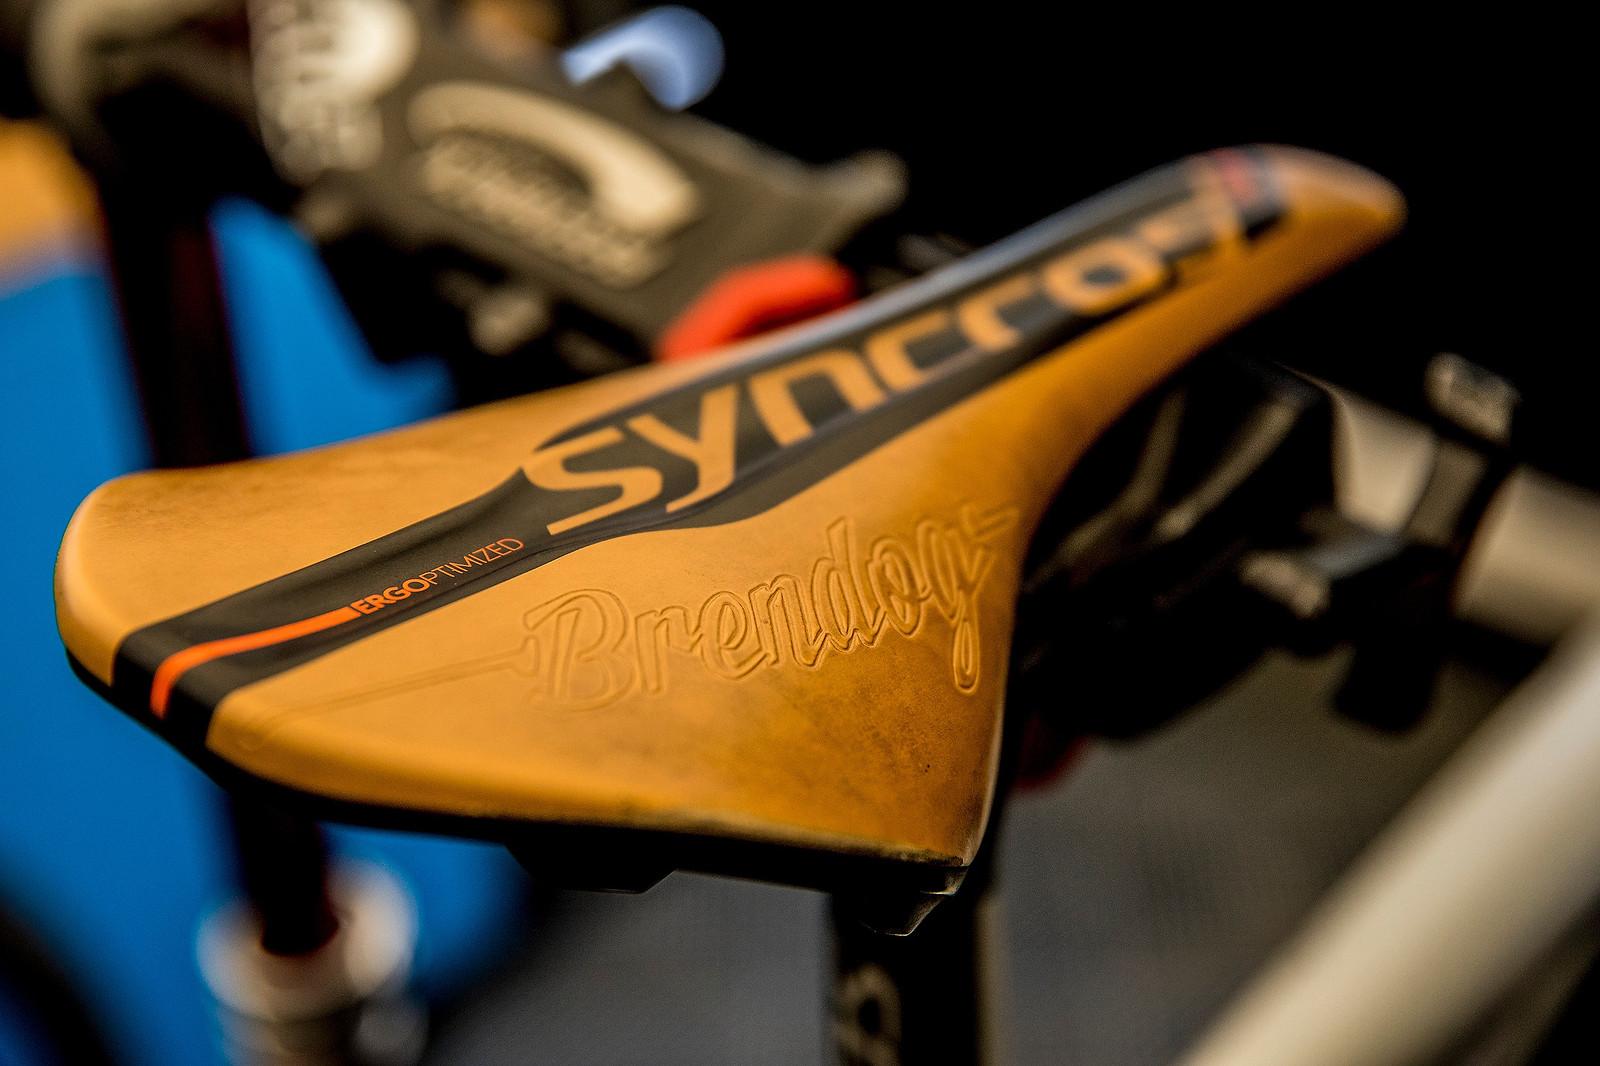 Vintage Pre-worn Leather for Brendog - 2017 Lourdes World Cup Pit Bits - Mountain Biking Pictures - Vital MTB